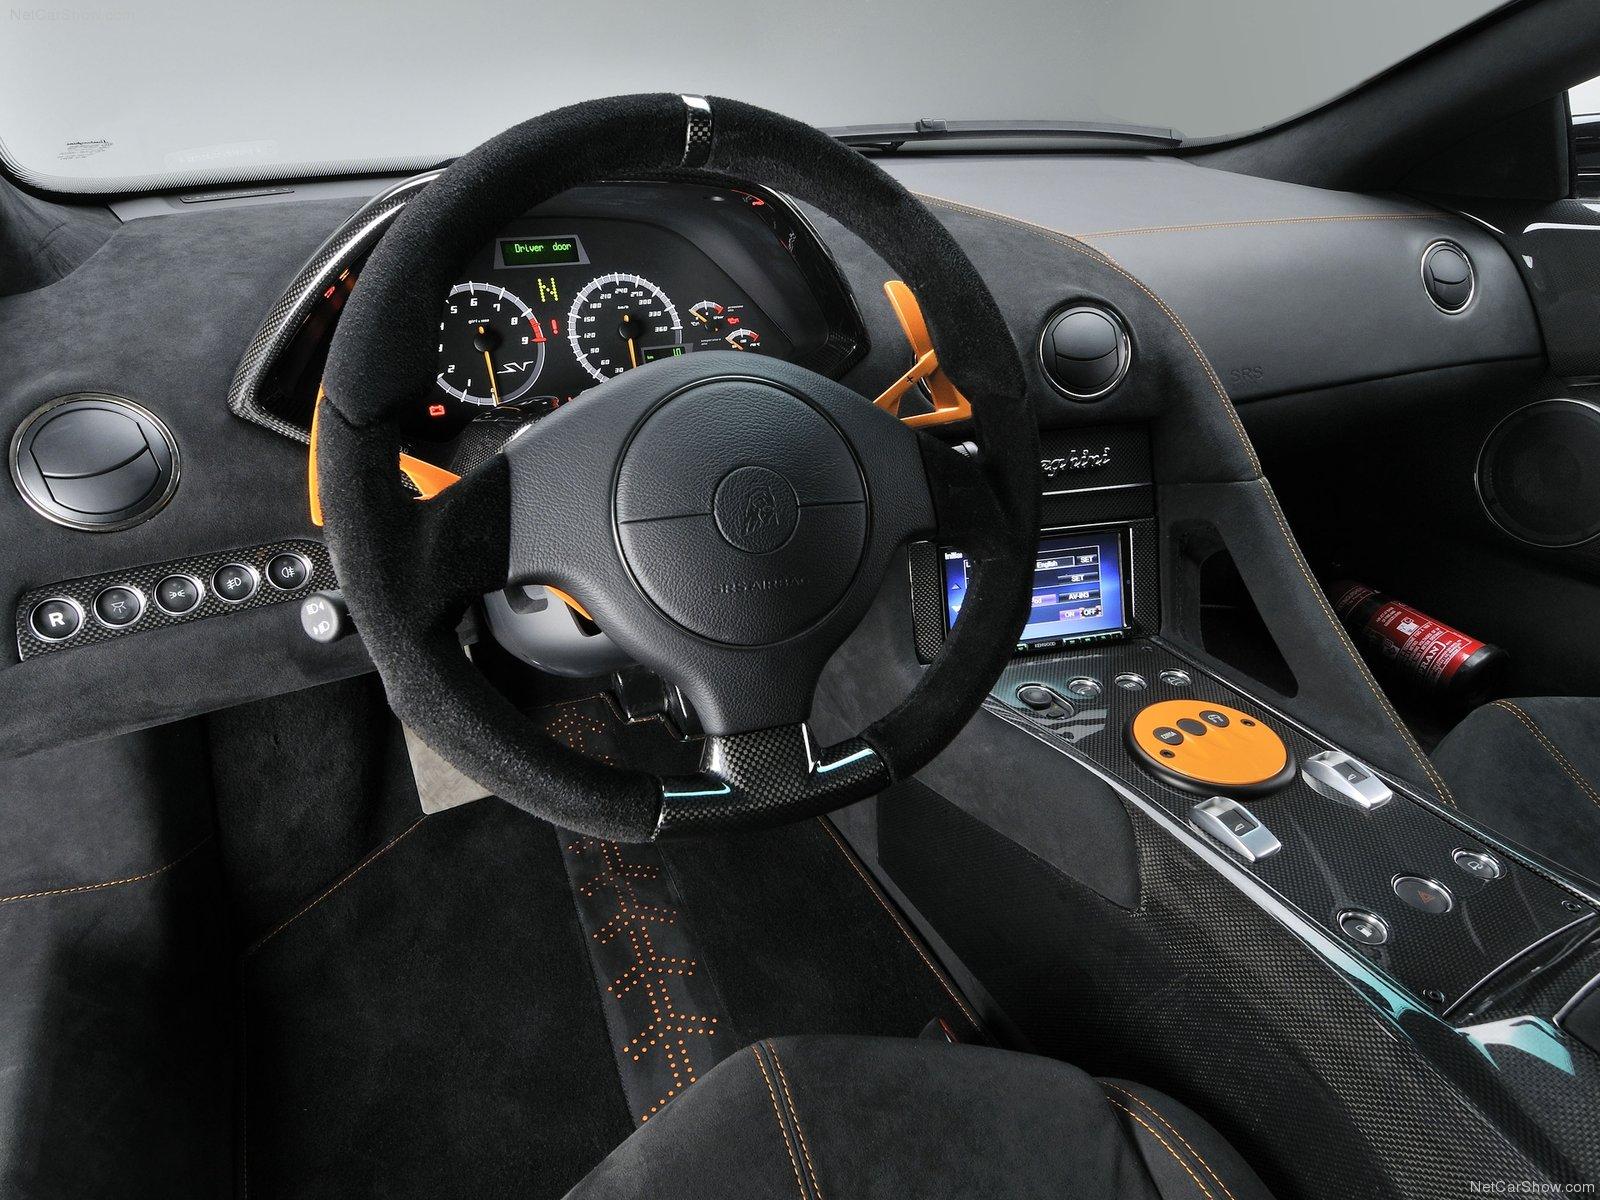 Hình ảnh siêu xe Lamborghini Murcielago LP670-4 SV China Edition 2010 & nội ngoại thất